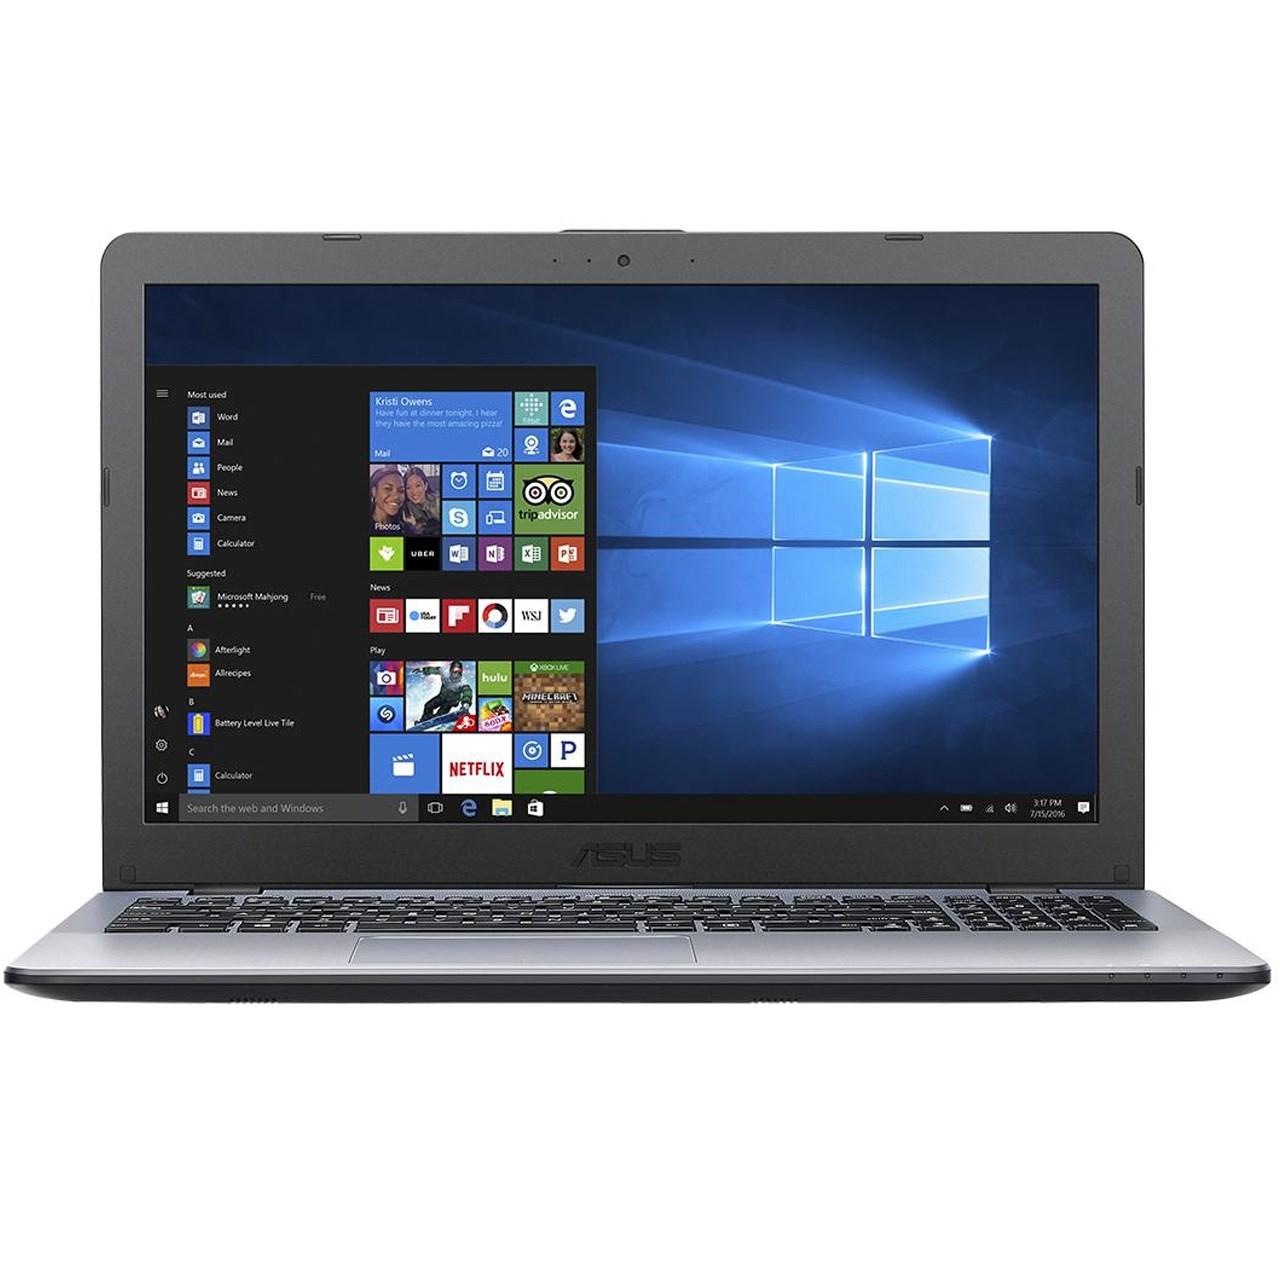 لپ تاپ 15 اینچی ایسوس مدل VivoBook R542UQ - D